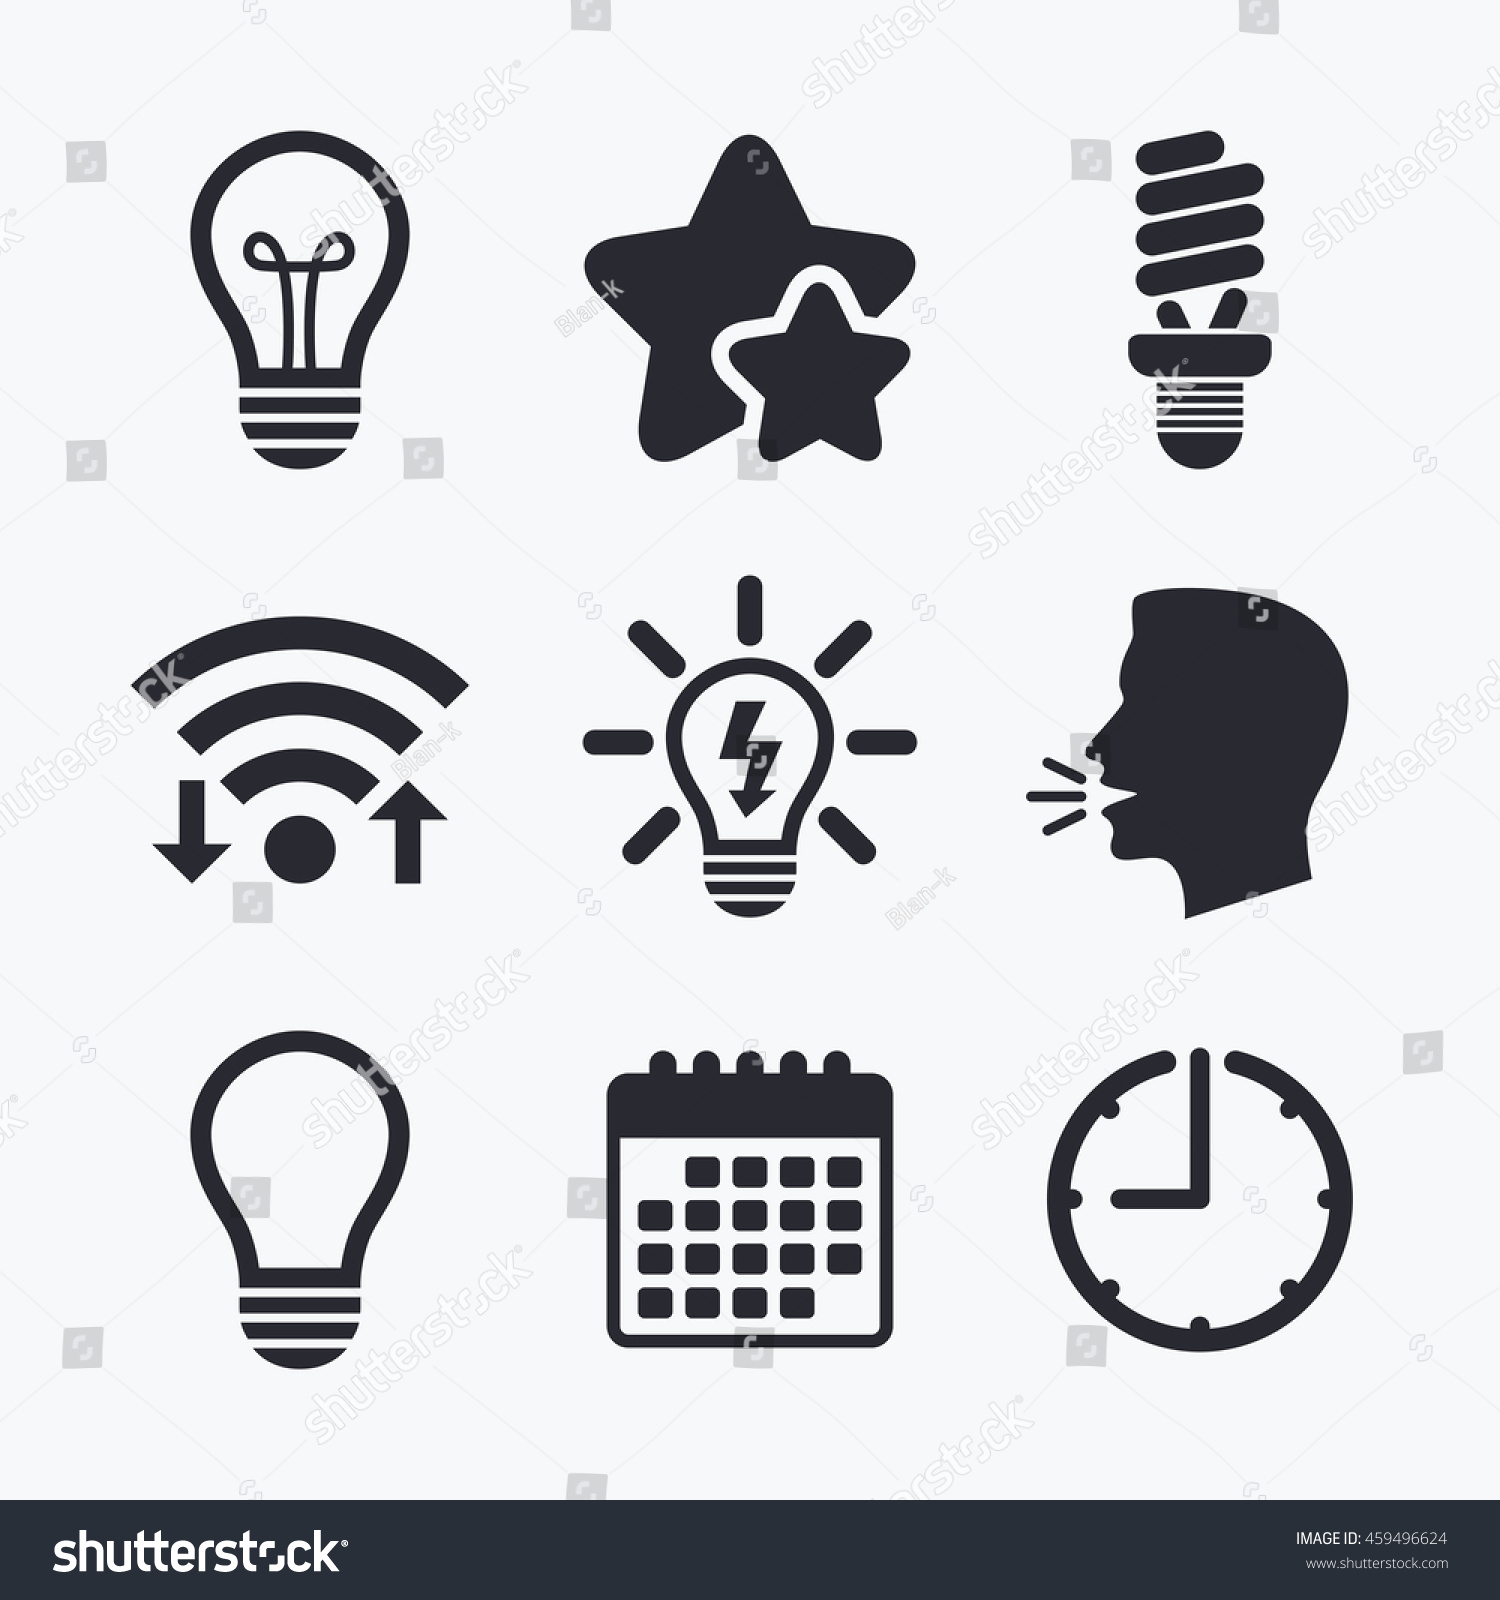 Excellent Electric Shock Symbol Images Electrical | Jzgreentown.com